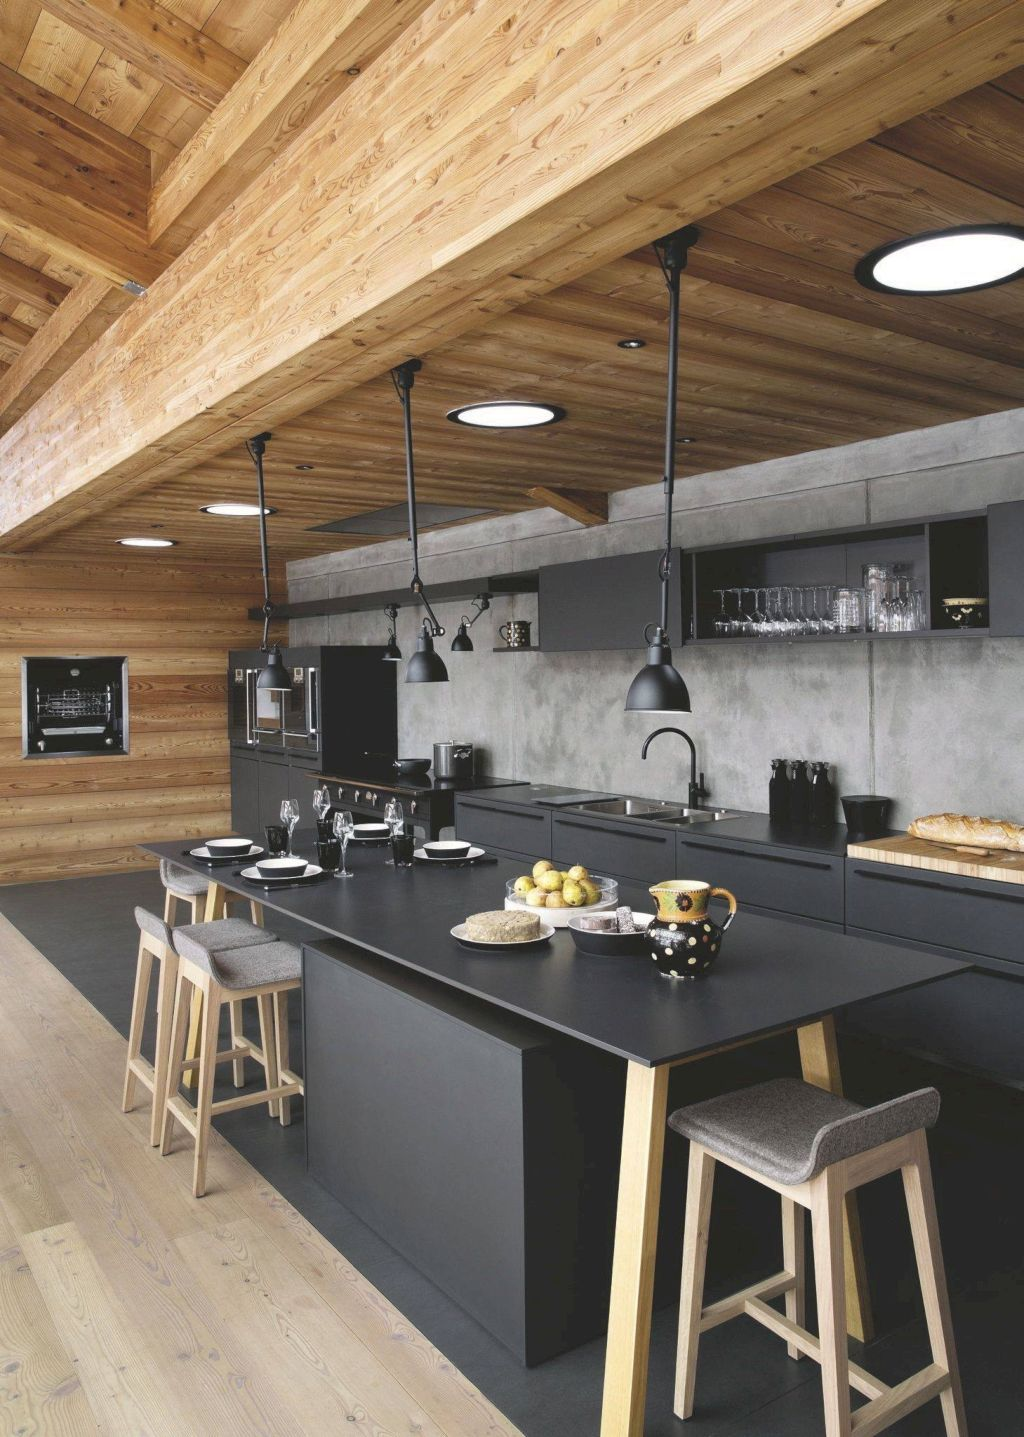 17 elegant contemporary kitchen ideas kjøkken inspirasjon on kitchen ideas elegant id=22852